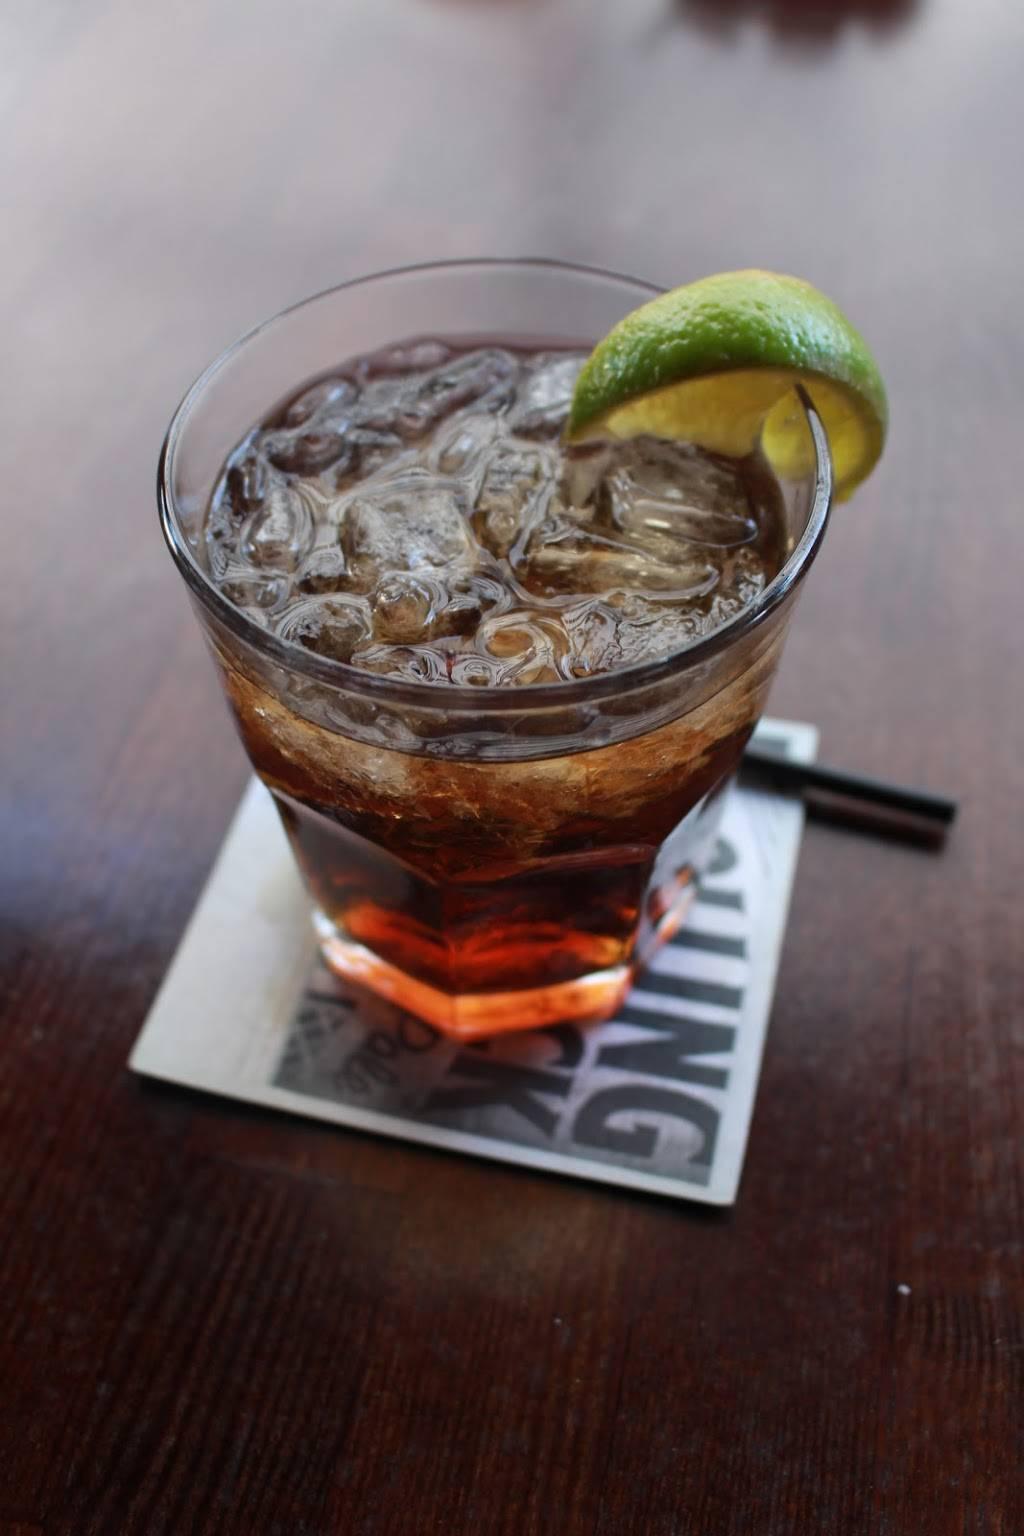 Shannons On Pine Irish Pub & Sports Bar   night club   209 Pine Ave, Long Beach, CA 90802, USA   5624364363 OR +1 562-436-4363